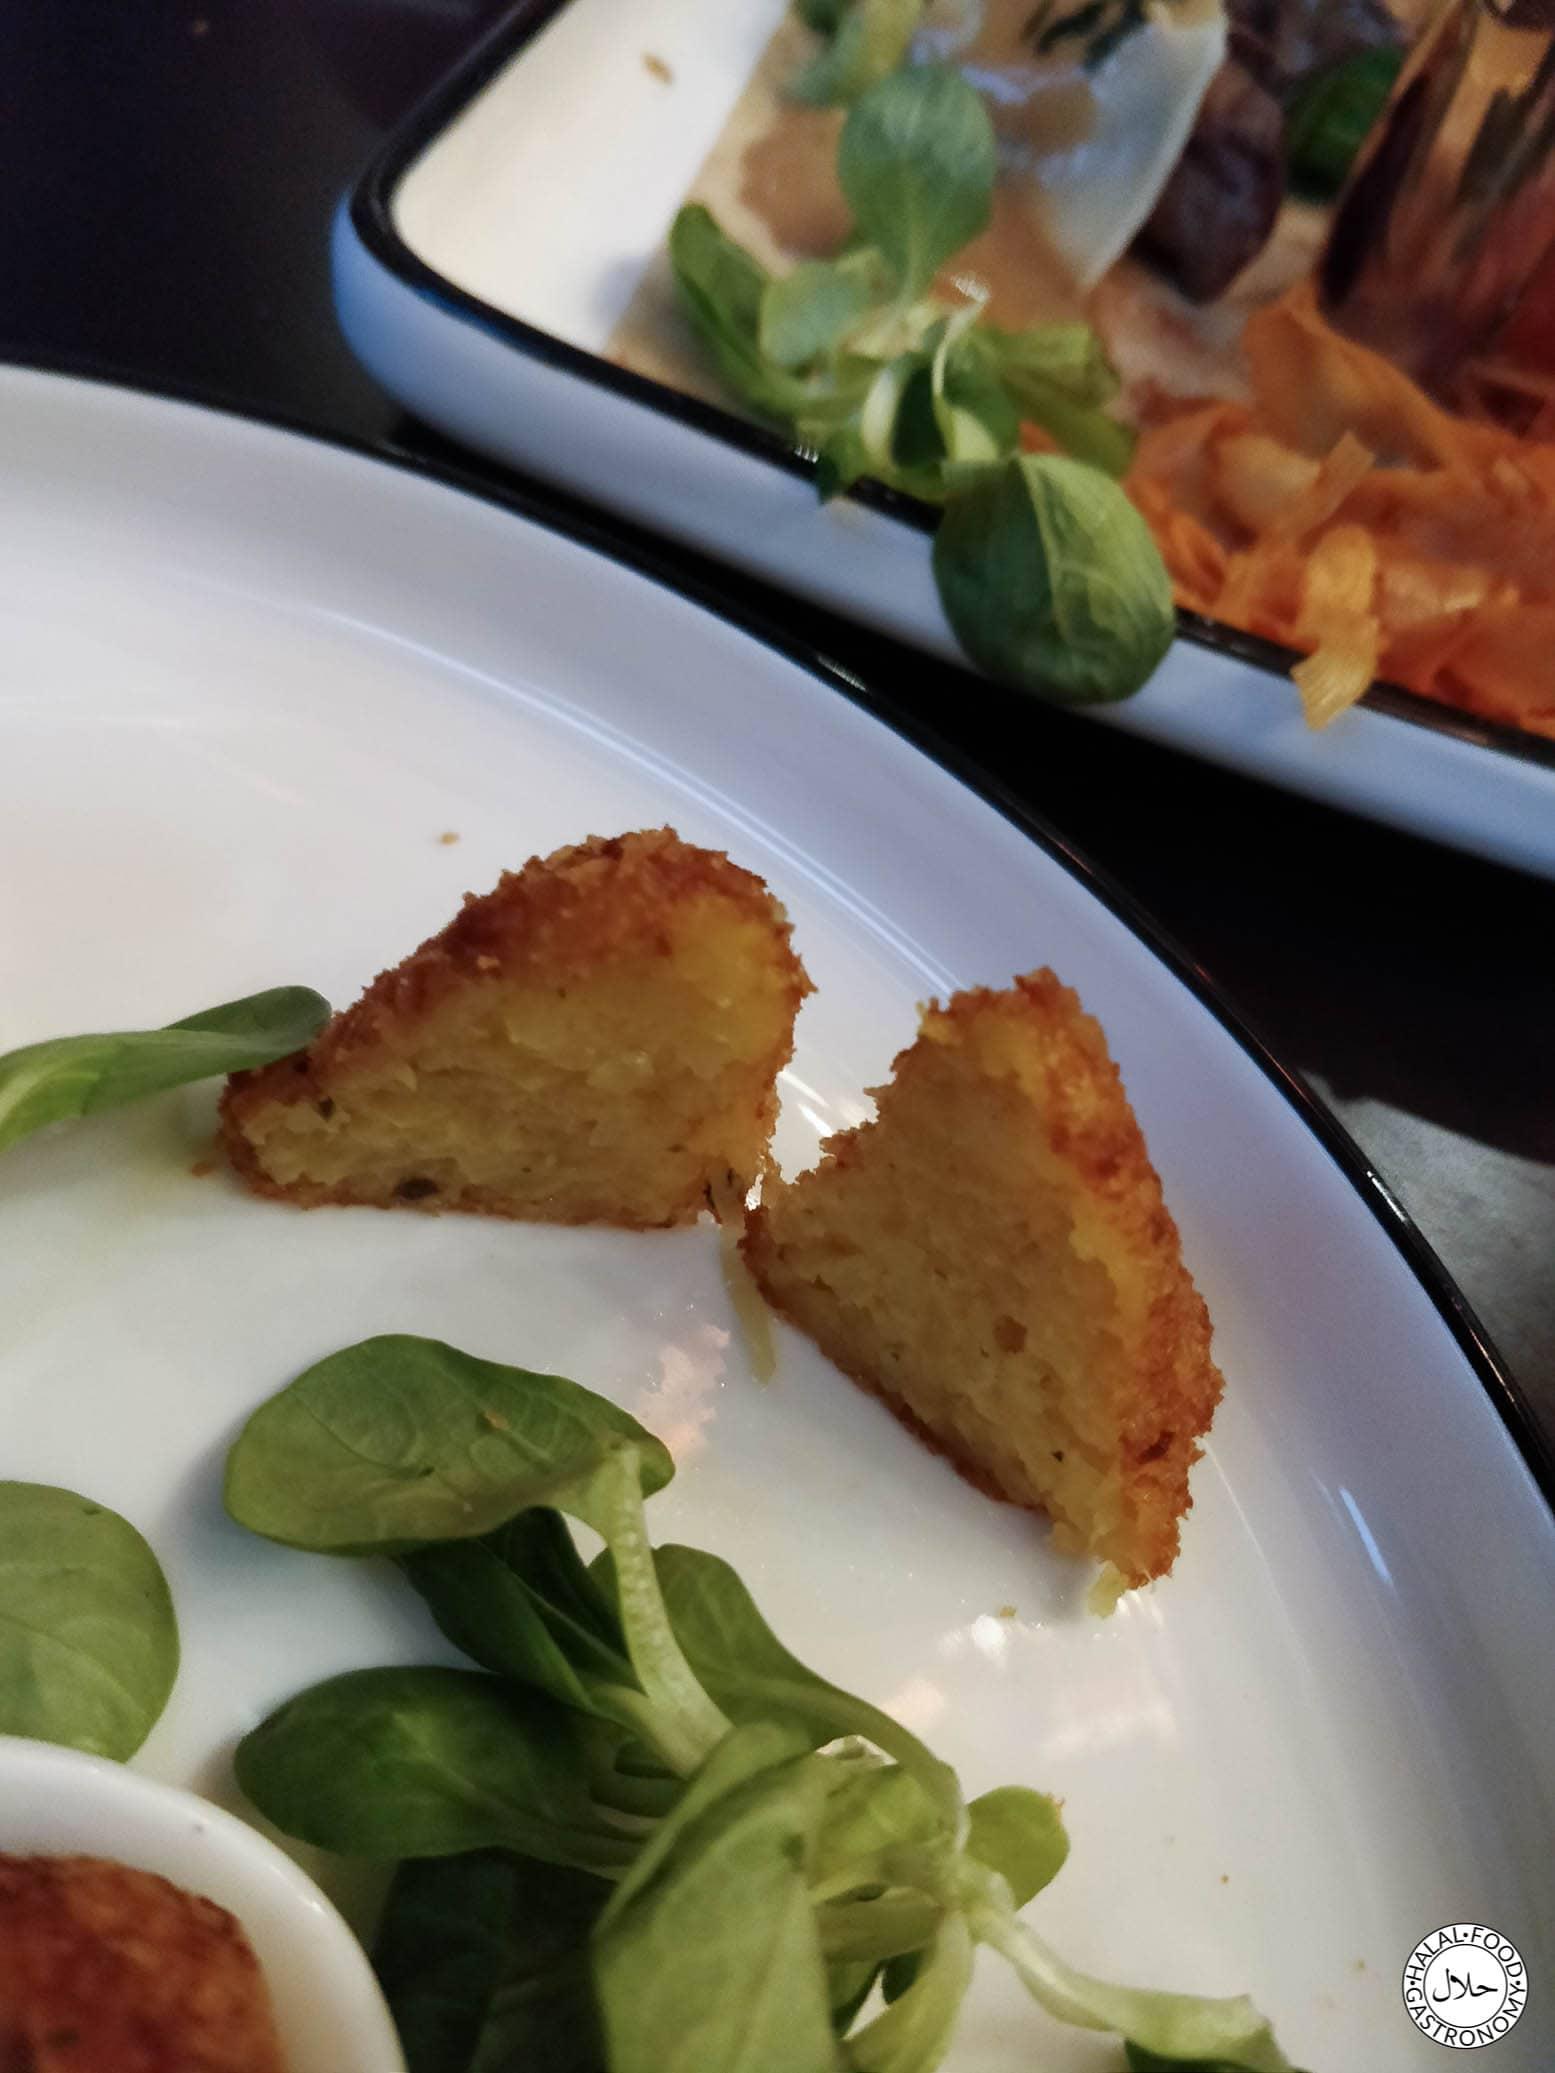 Ribeye Steakhouse Manchester Review inc Menu - Halal Food